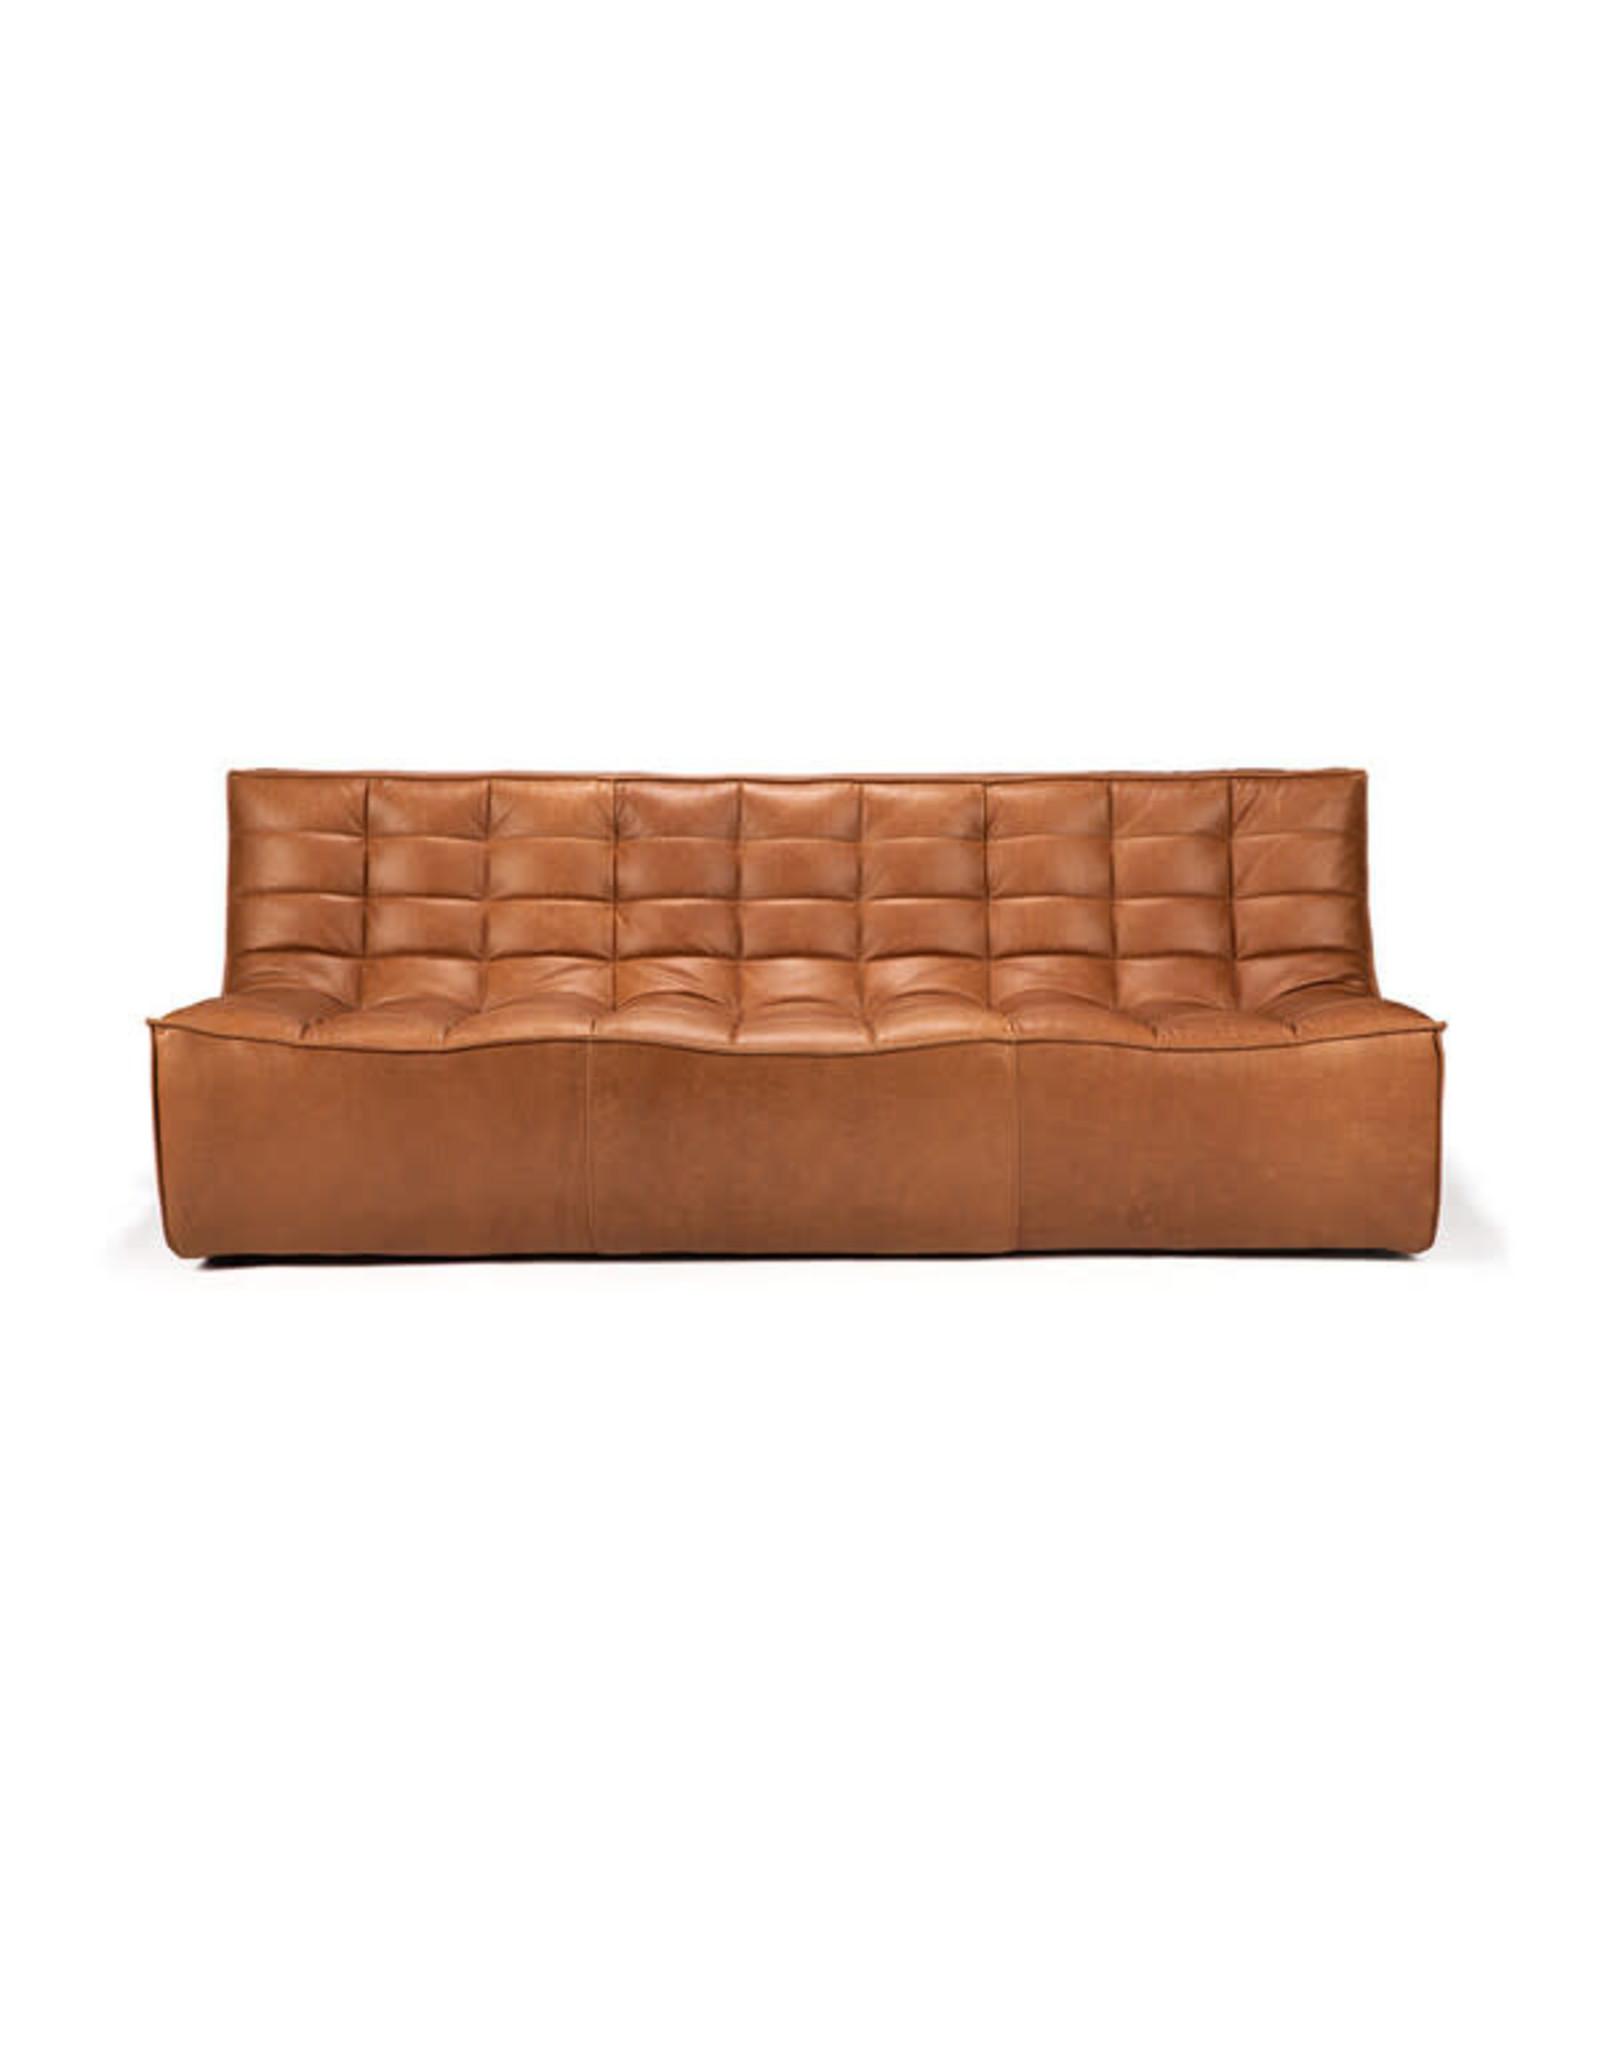 Ethnicraft N701 Sofa,  Three-Seater